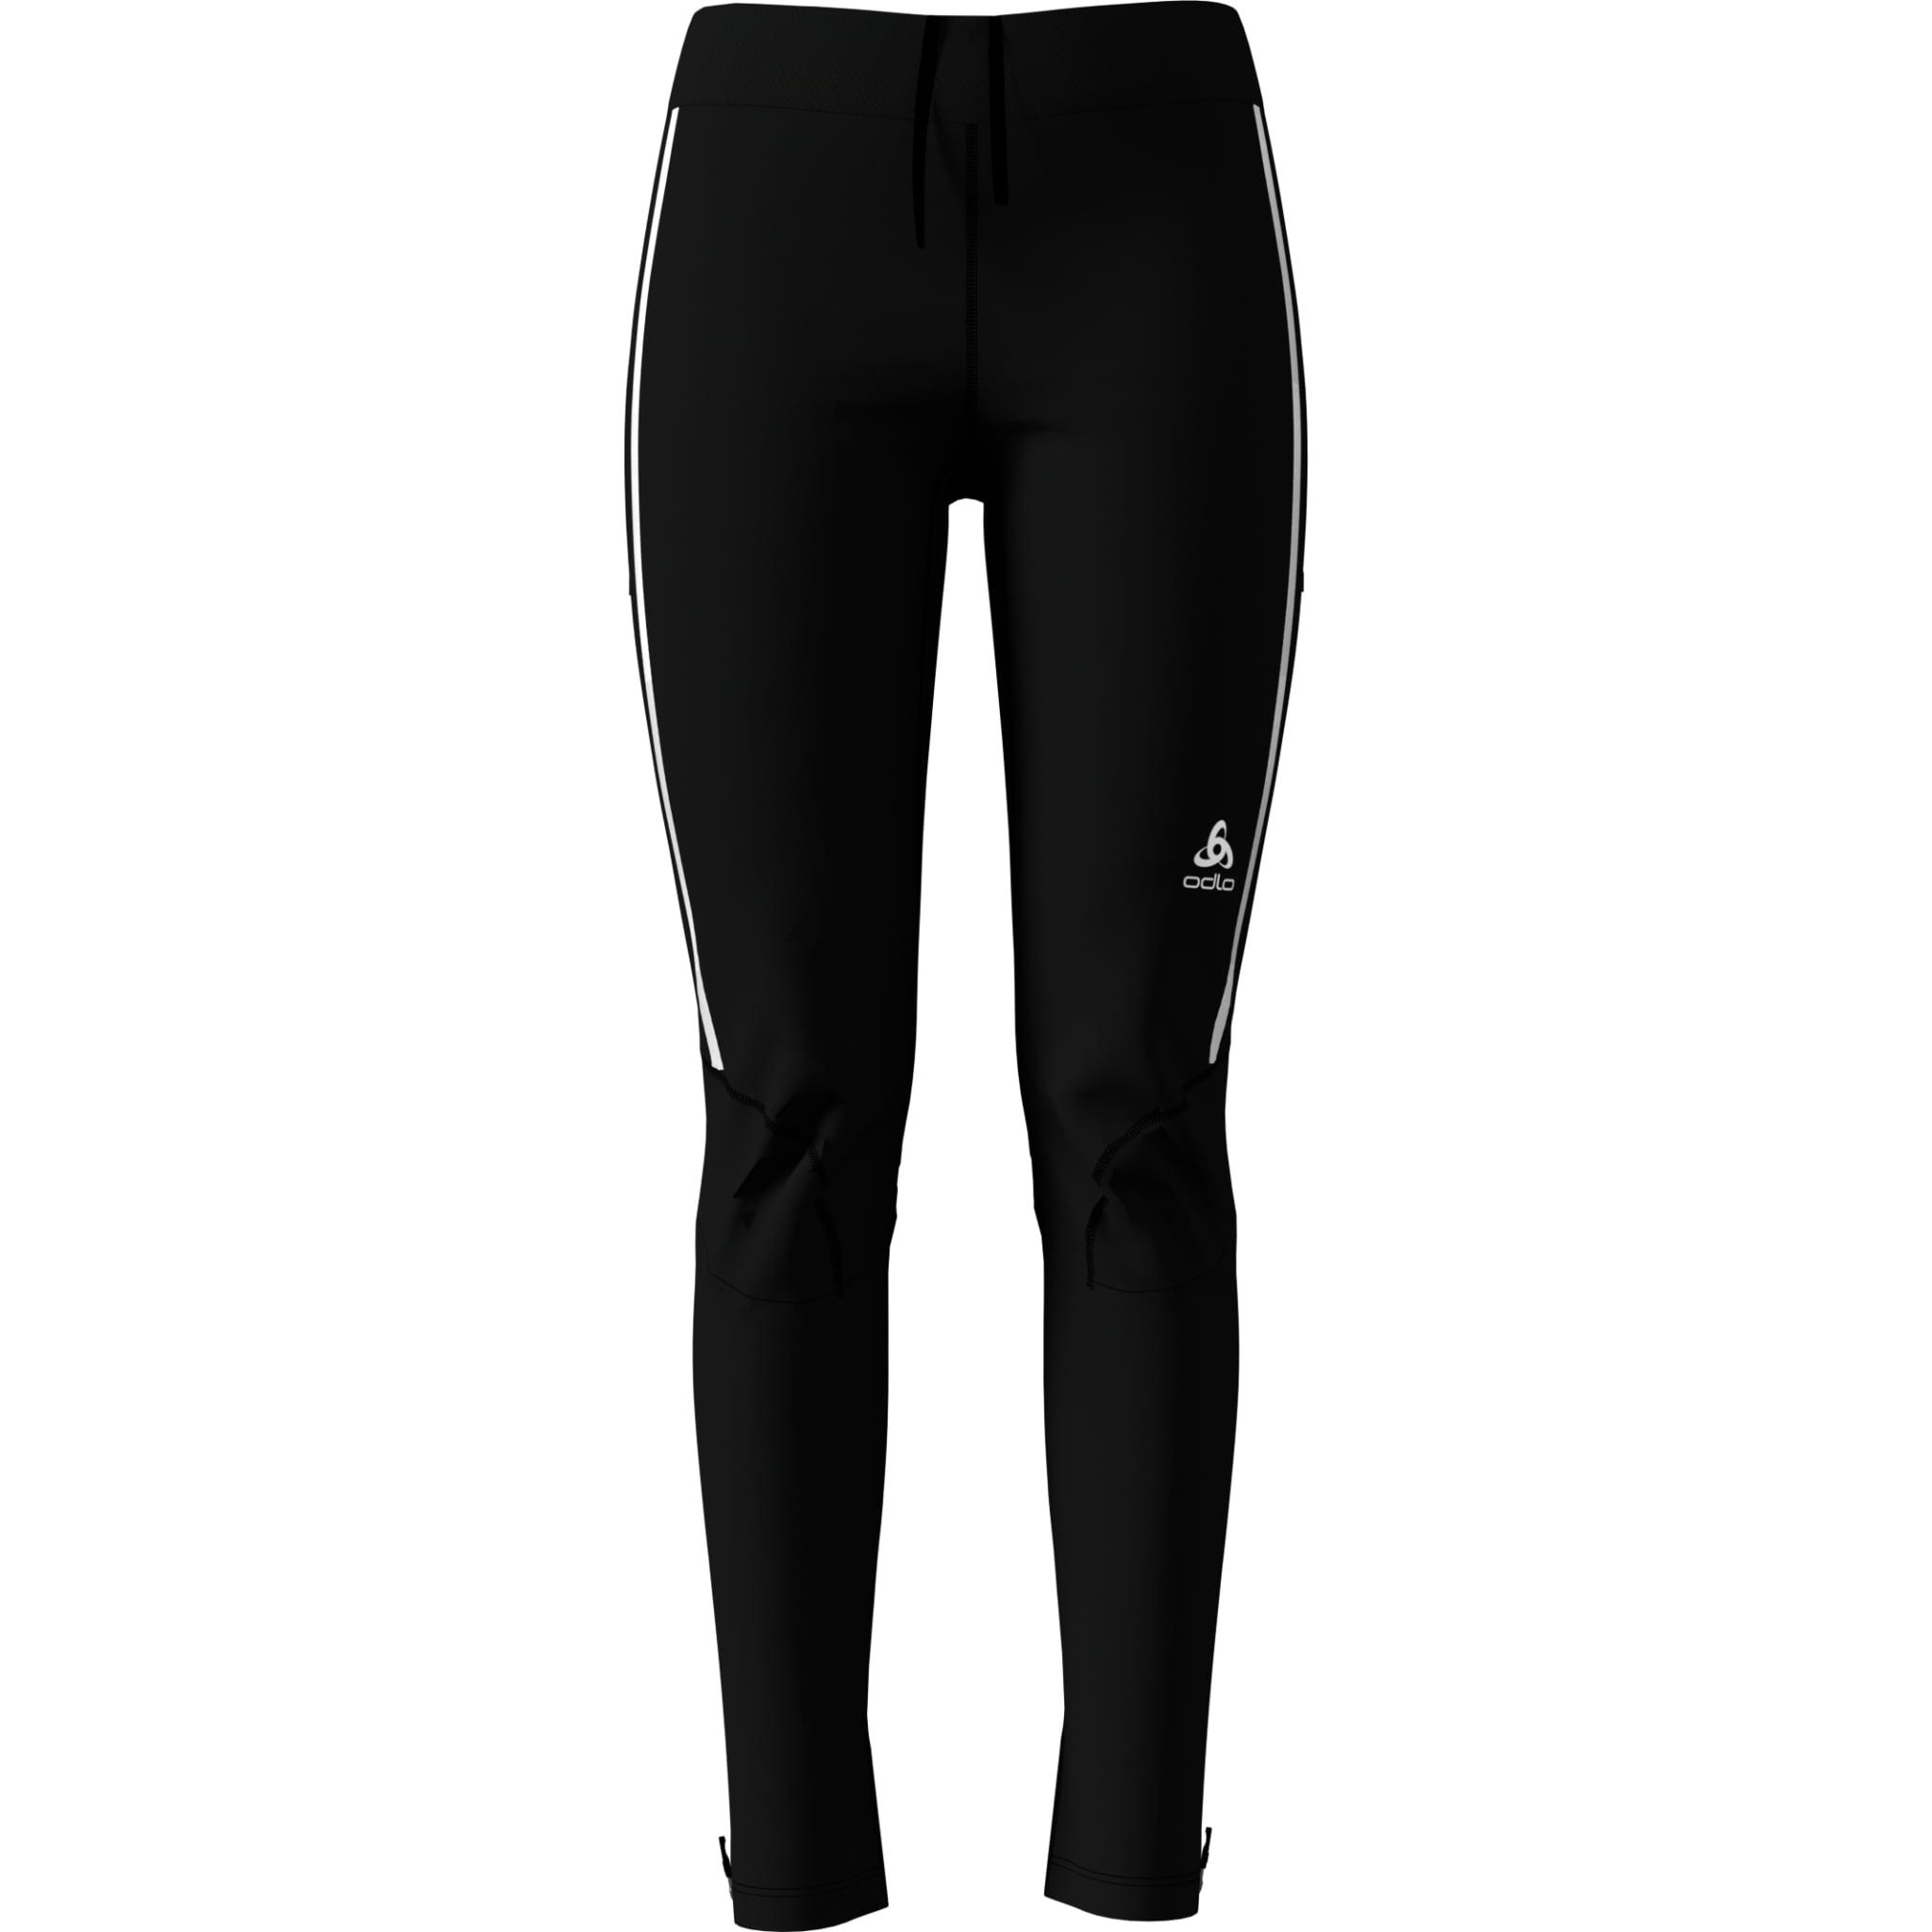 Aeolus Pro Warm Pants W